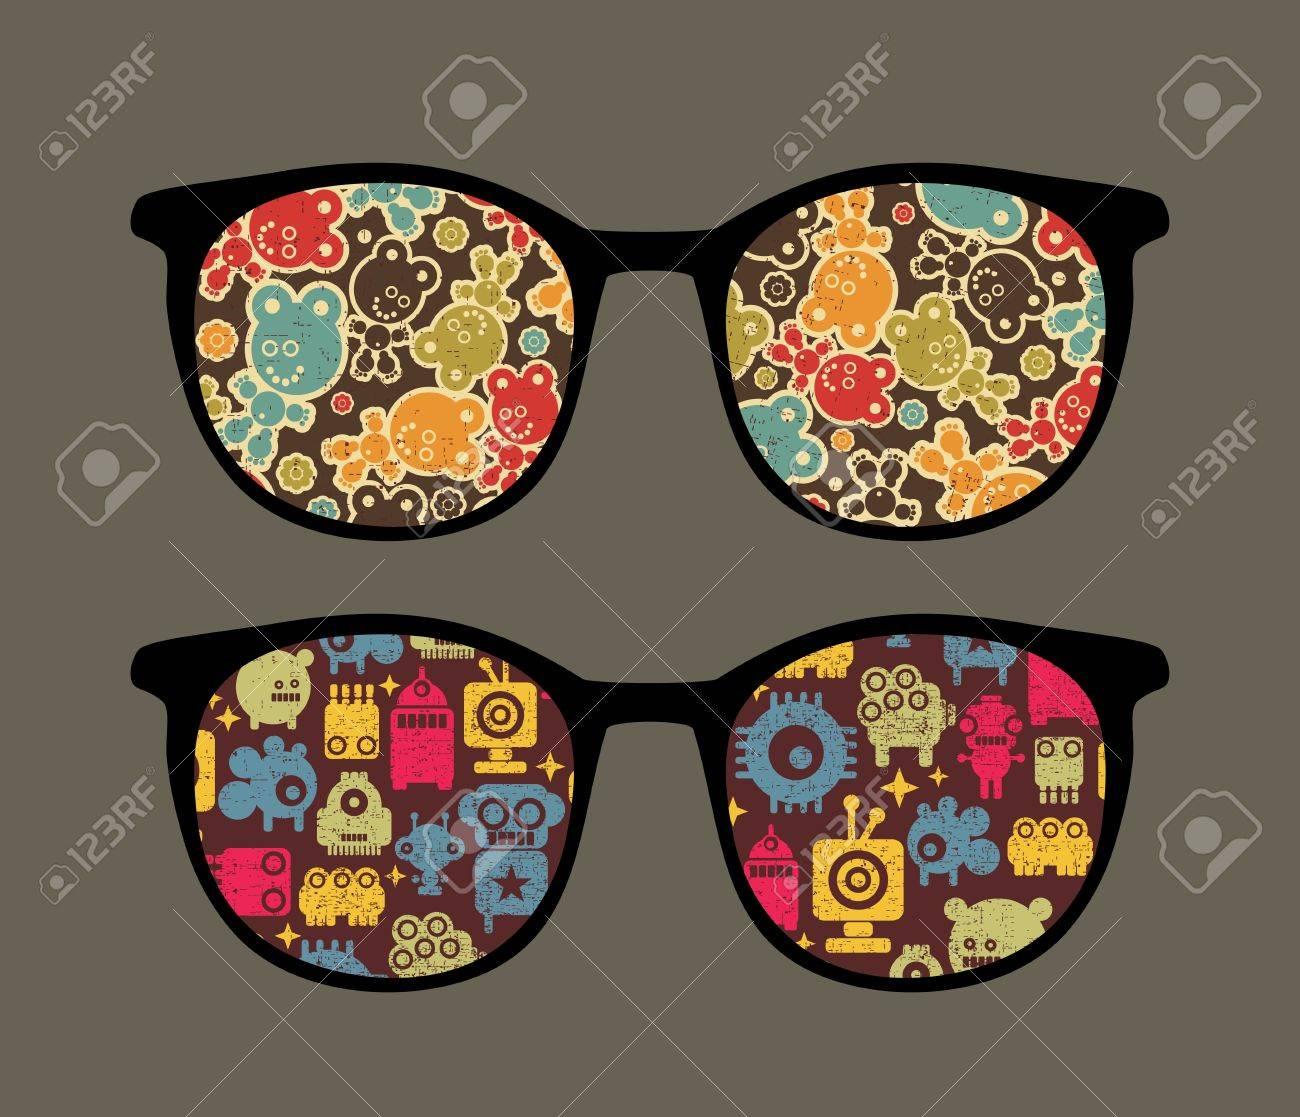 Retro eyeglasses with strange robots reflection in it. Stock Vector - 12957484